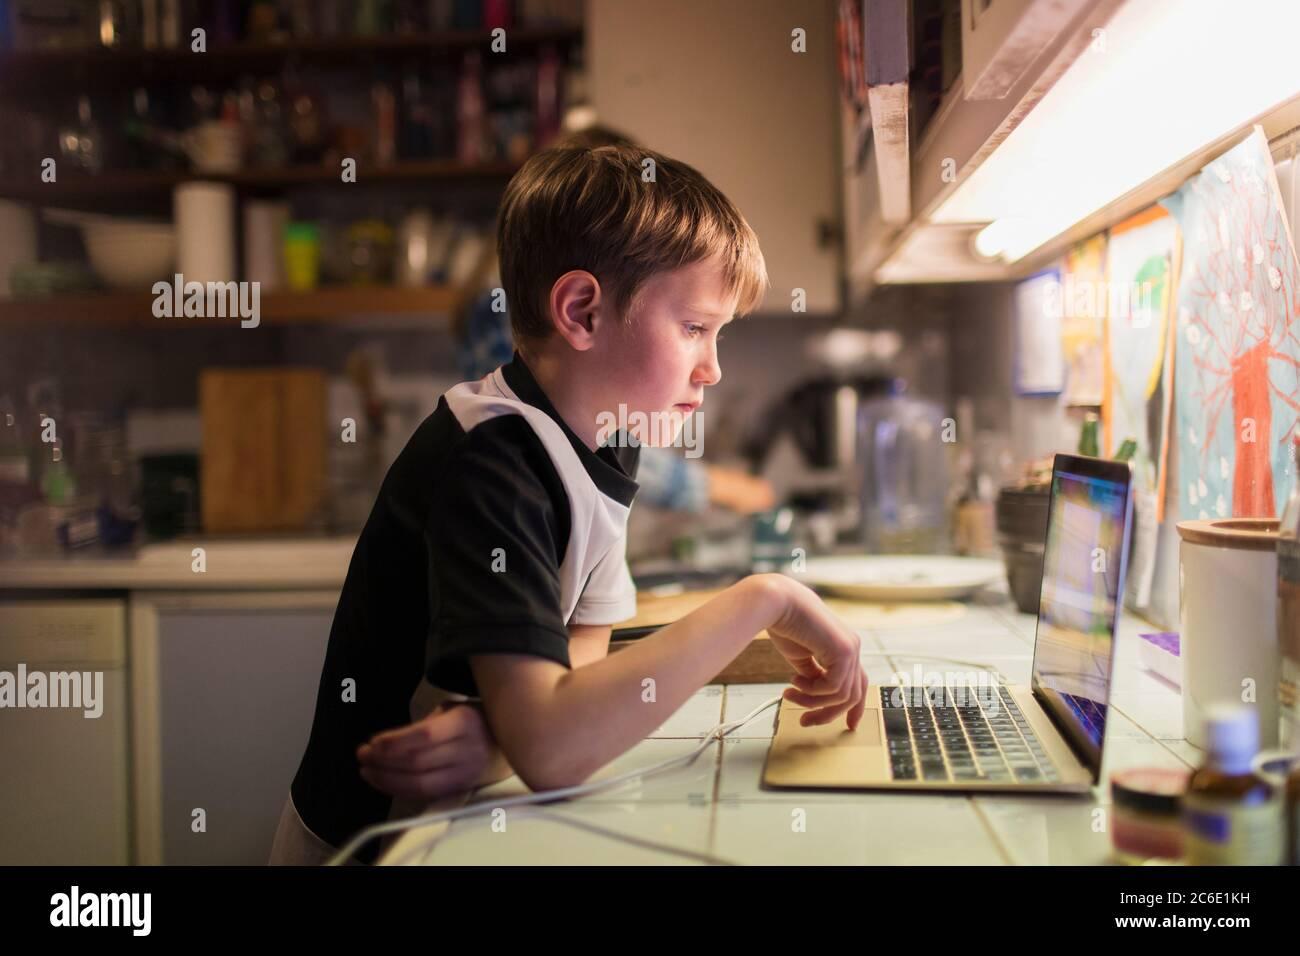 Boy doing homework at laptop on kitchen counter Stock Photo